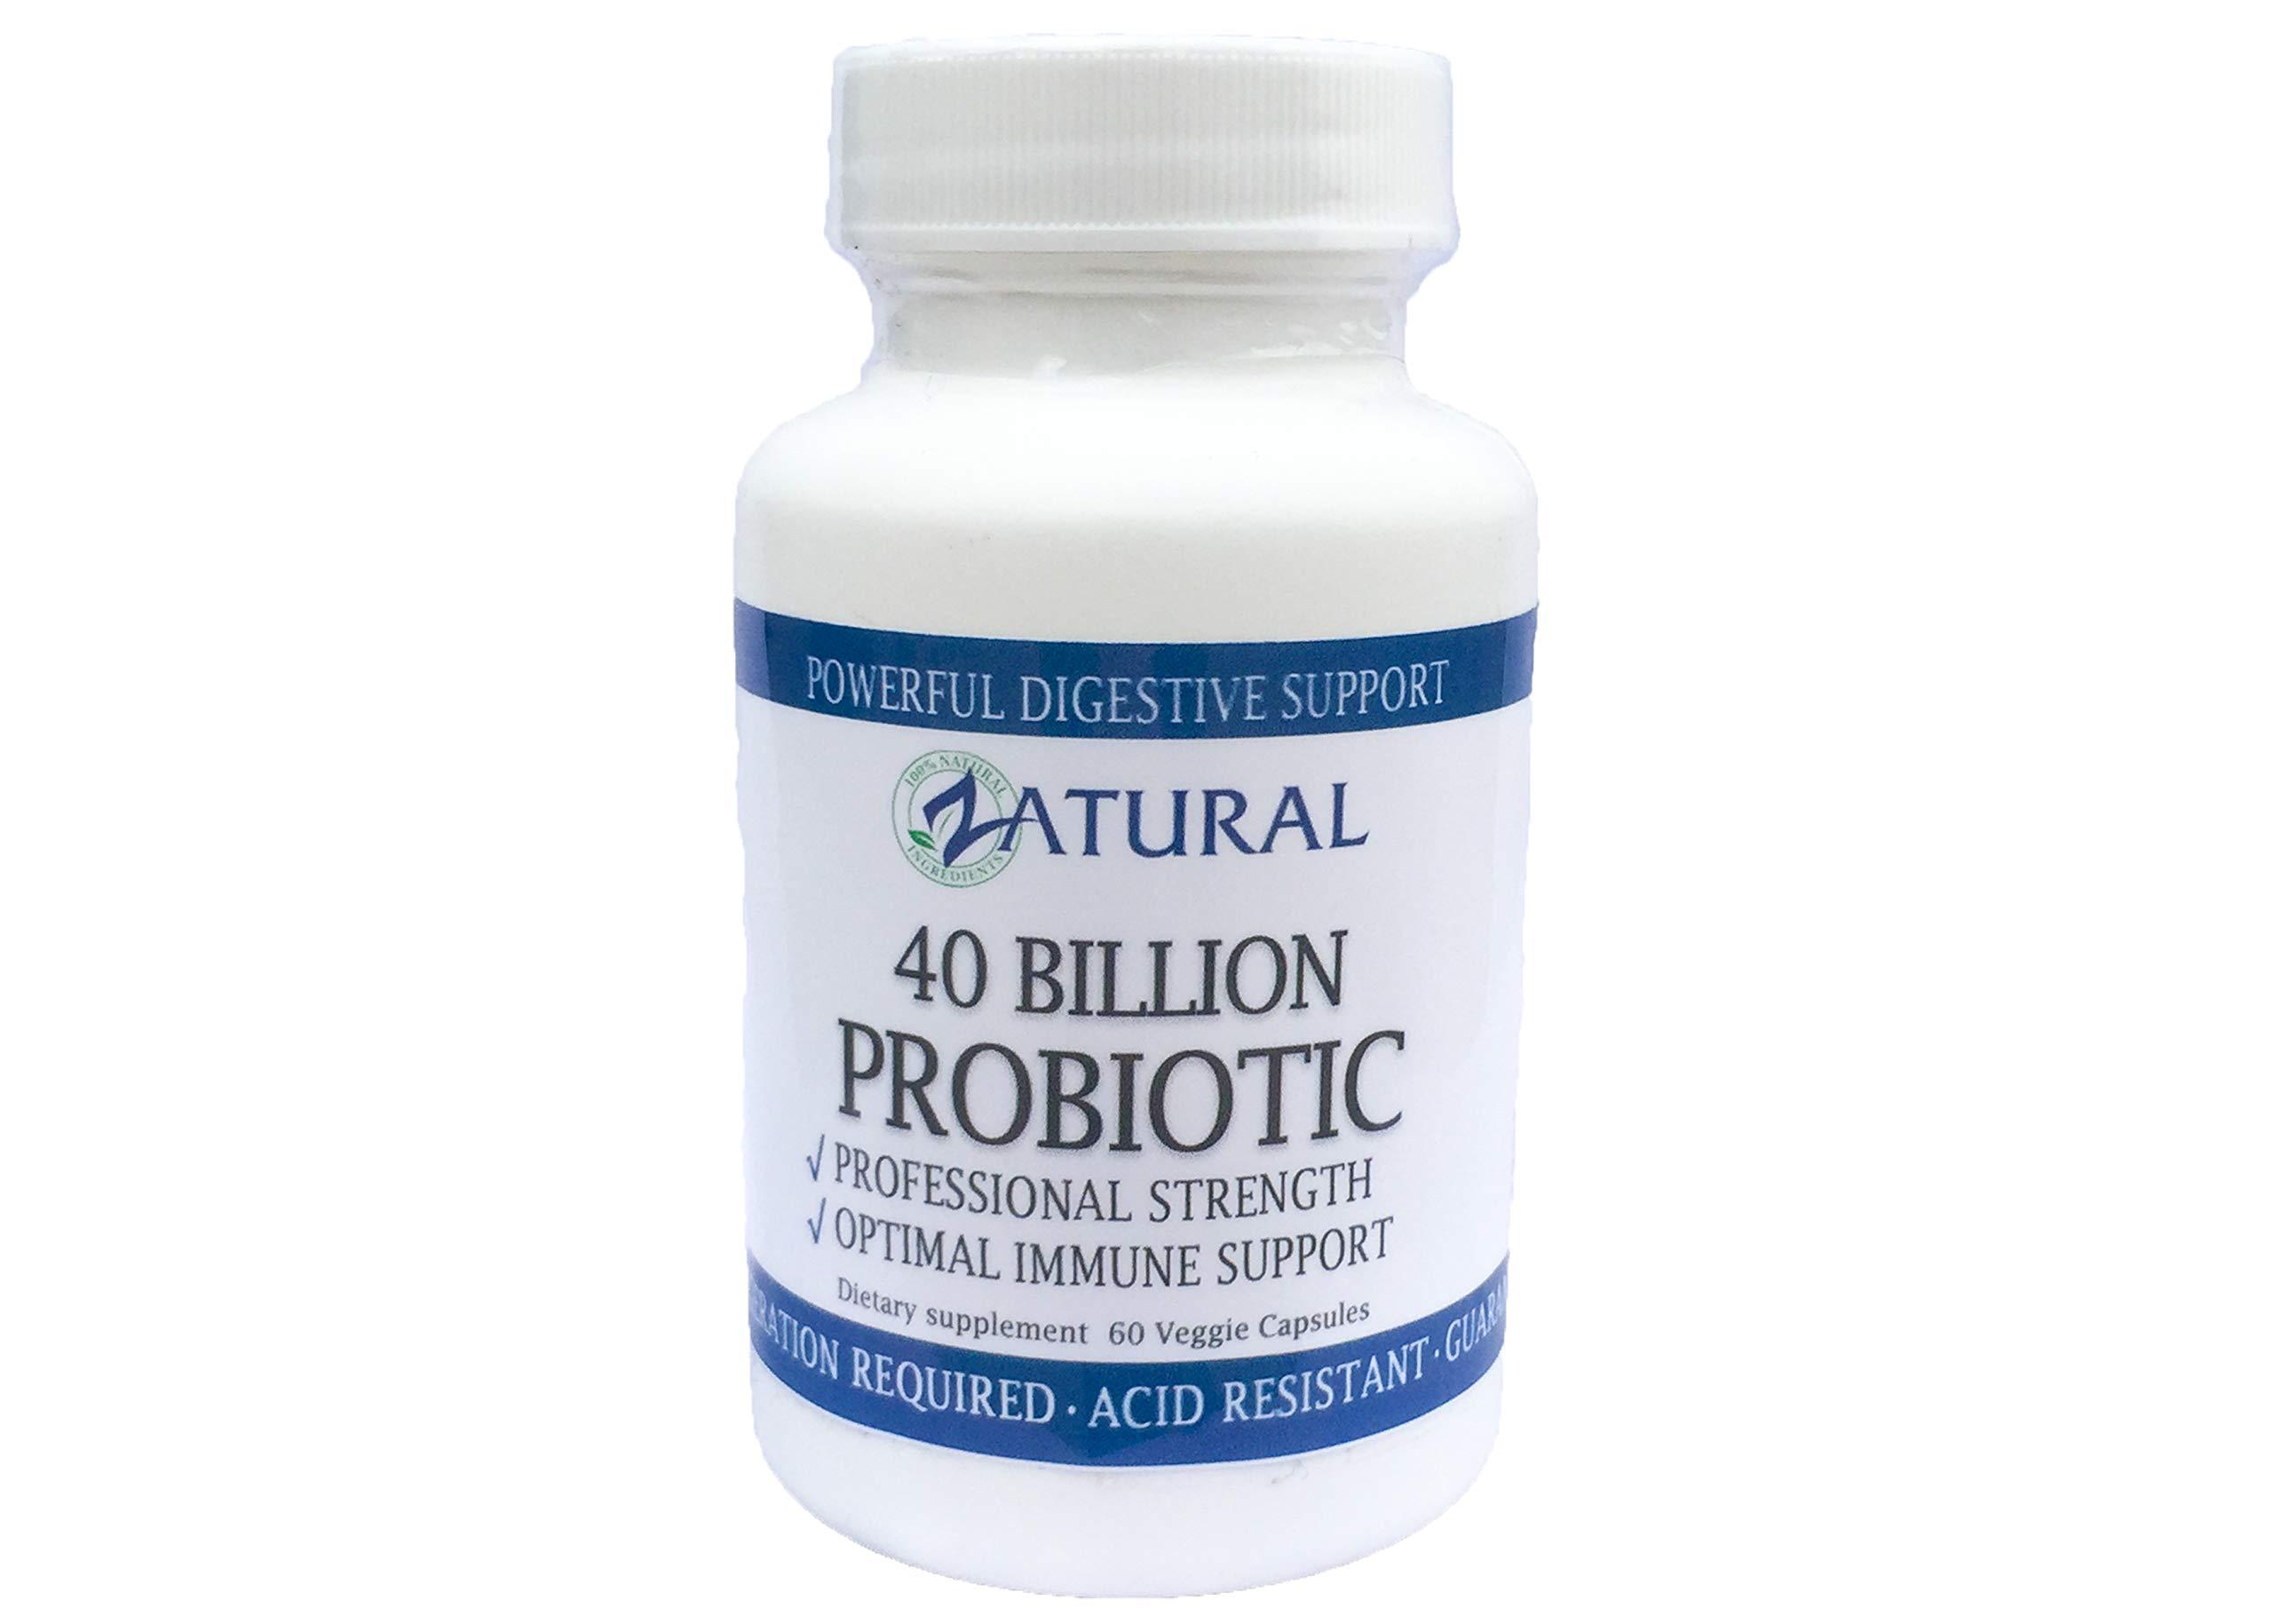 Probiotic 40 Billion-Deep Immune Support-Professional Strength, Doctor Formulated, Science Based- (1 Pack)